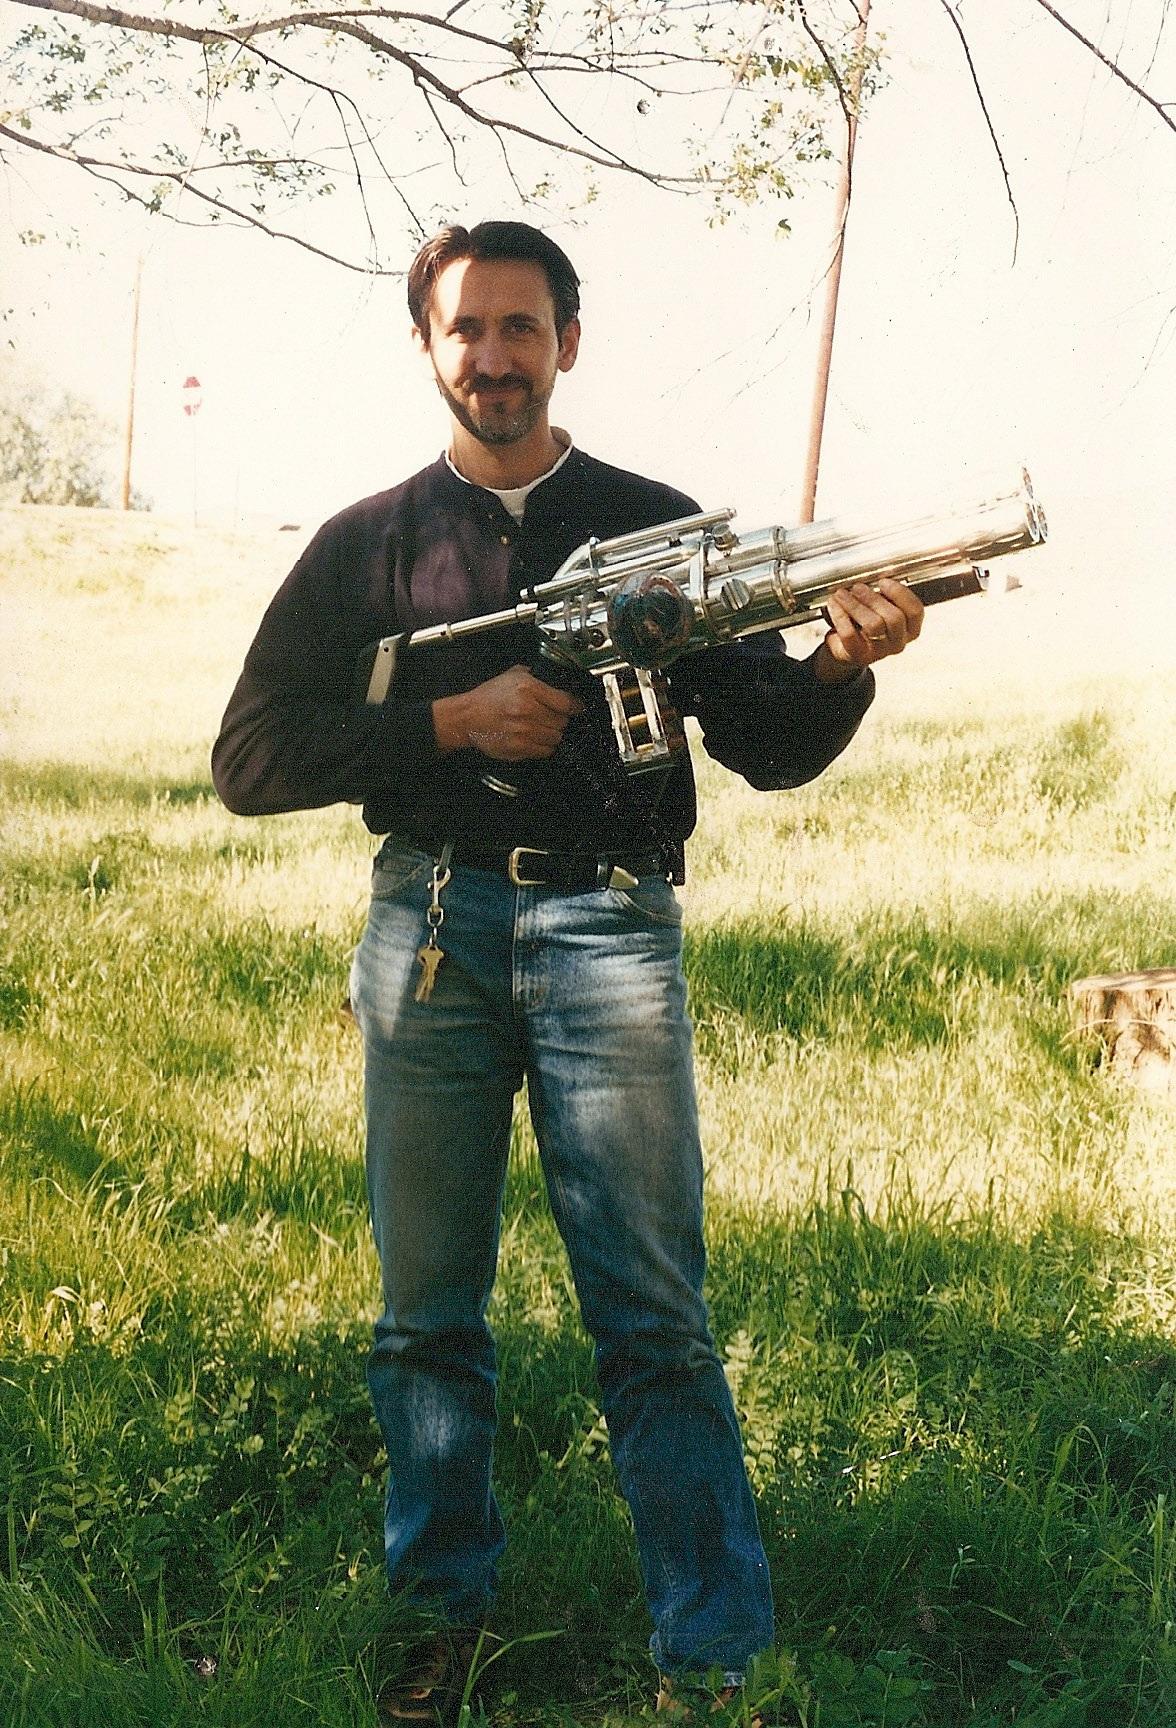 MIB_Arquellian Arm Cannon-Real Prop (11).jpg